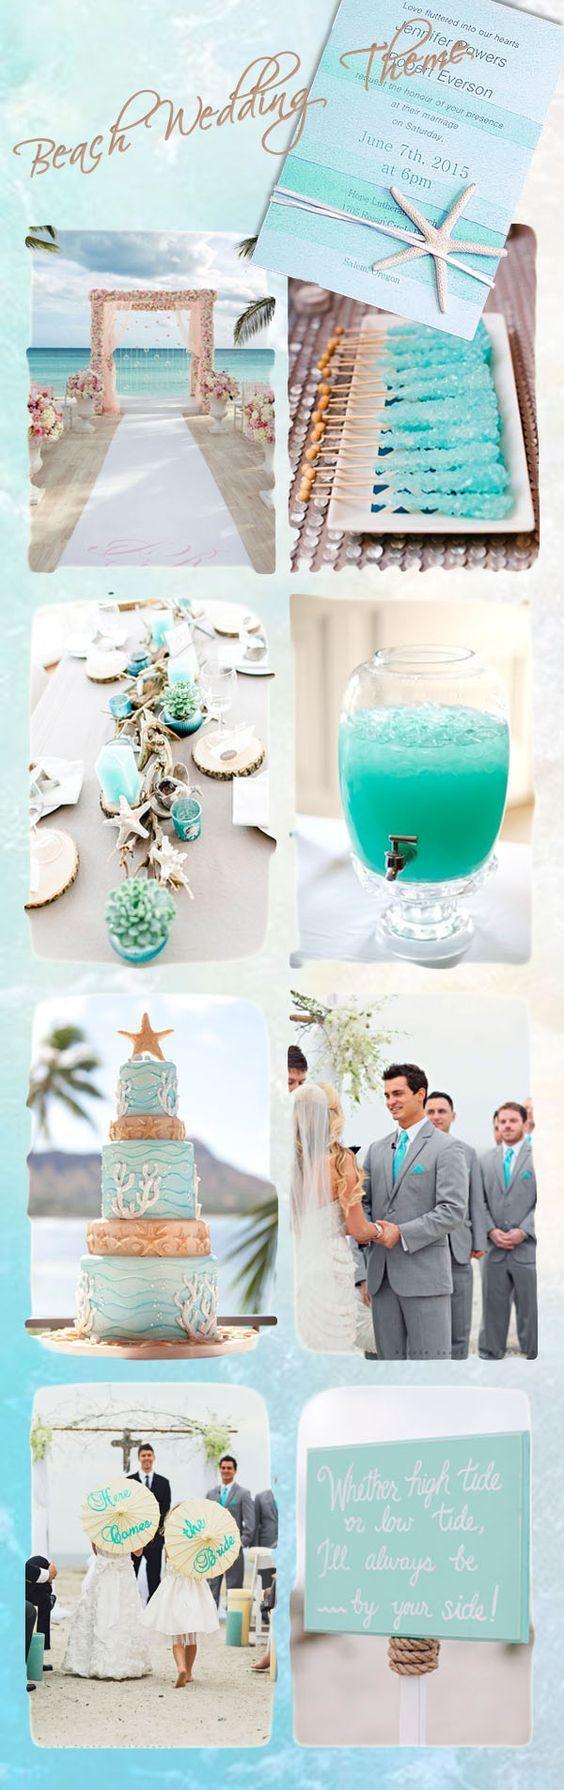 Beach wedding decoration ideas   best Beach wedding theme images on Pinterest  Beach weddings